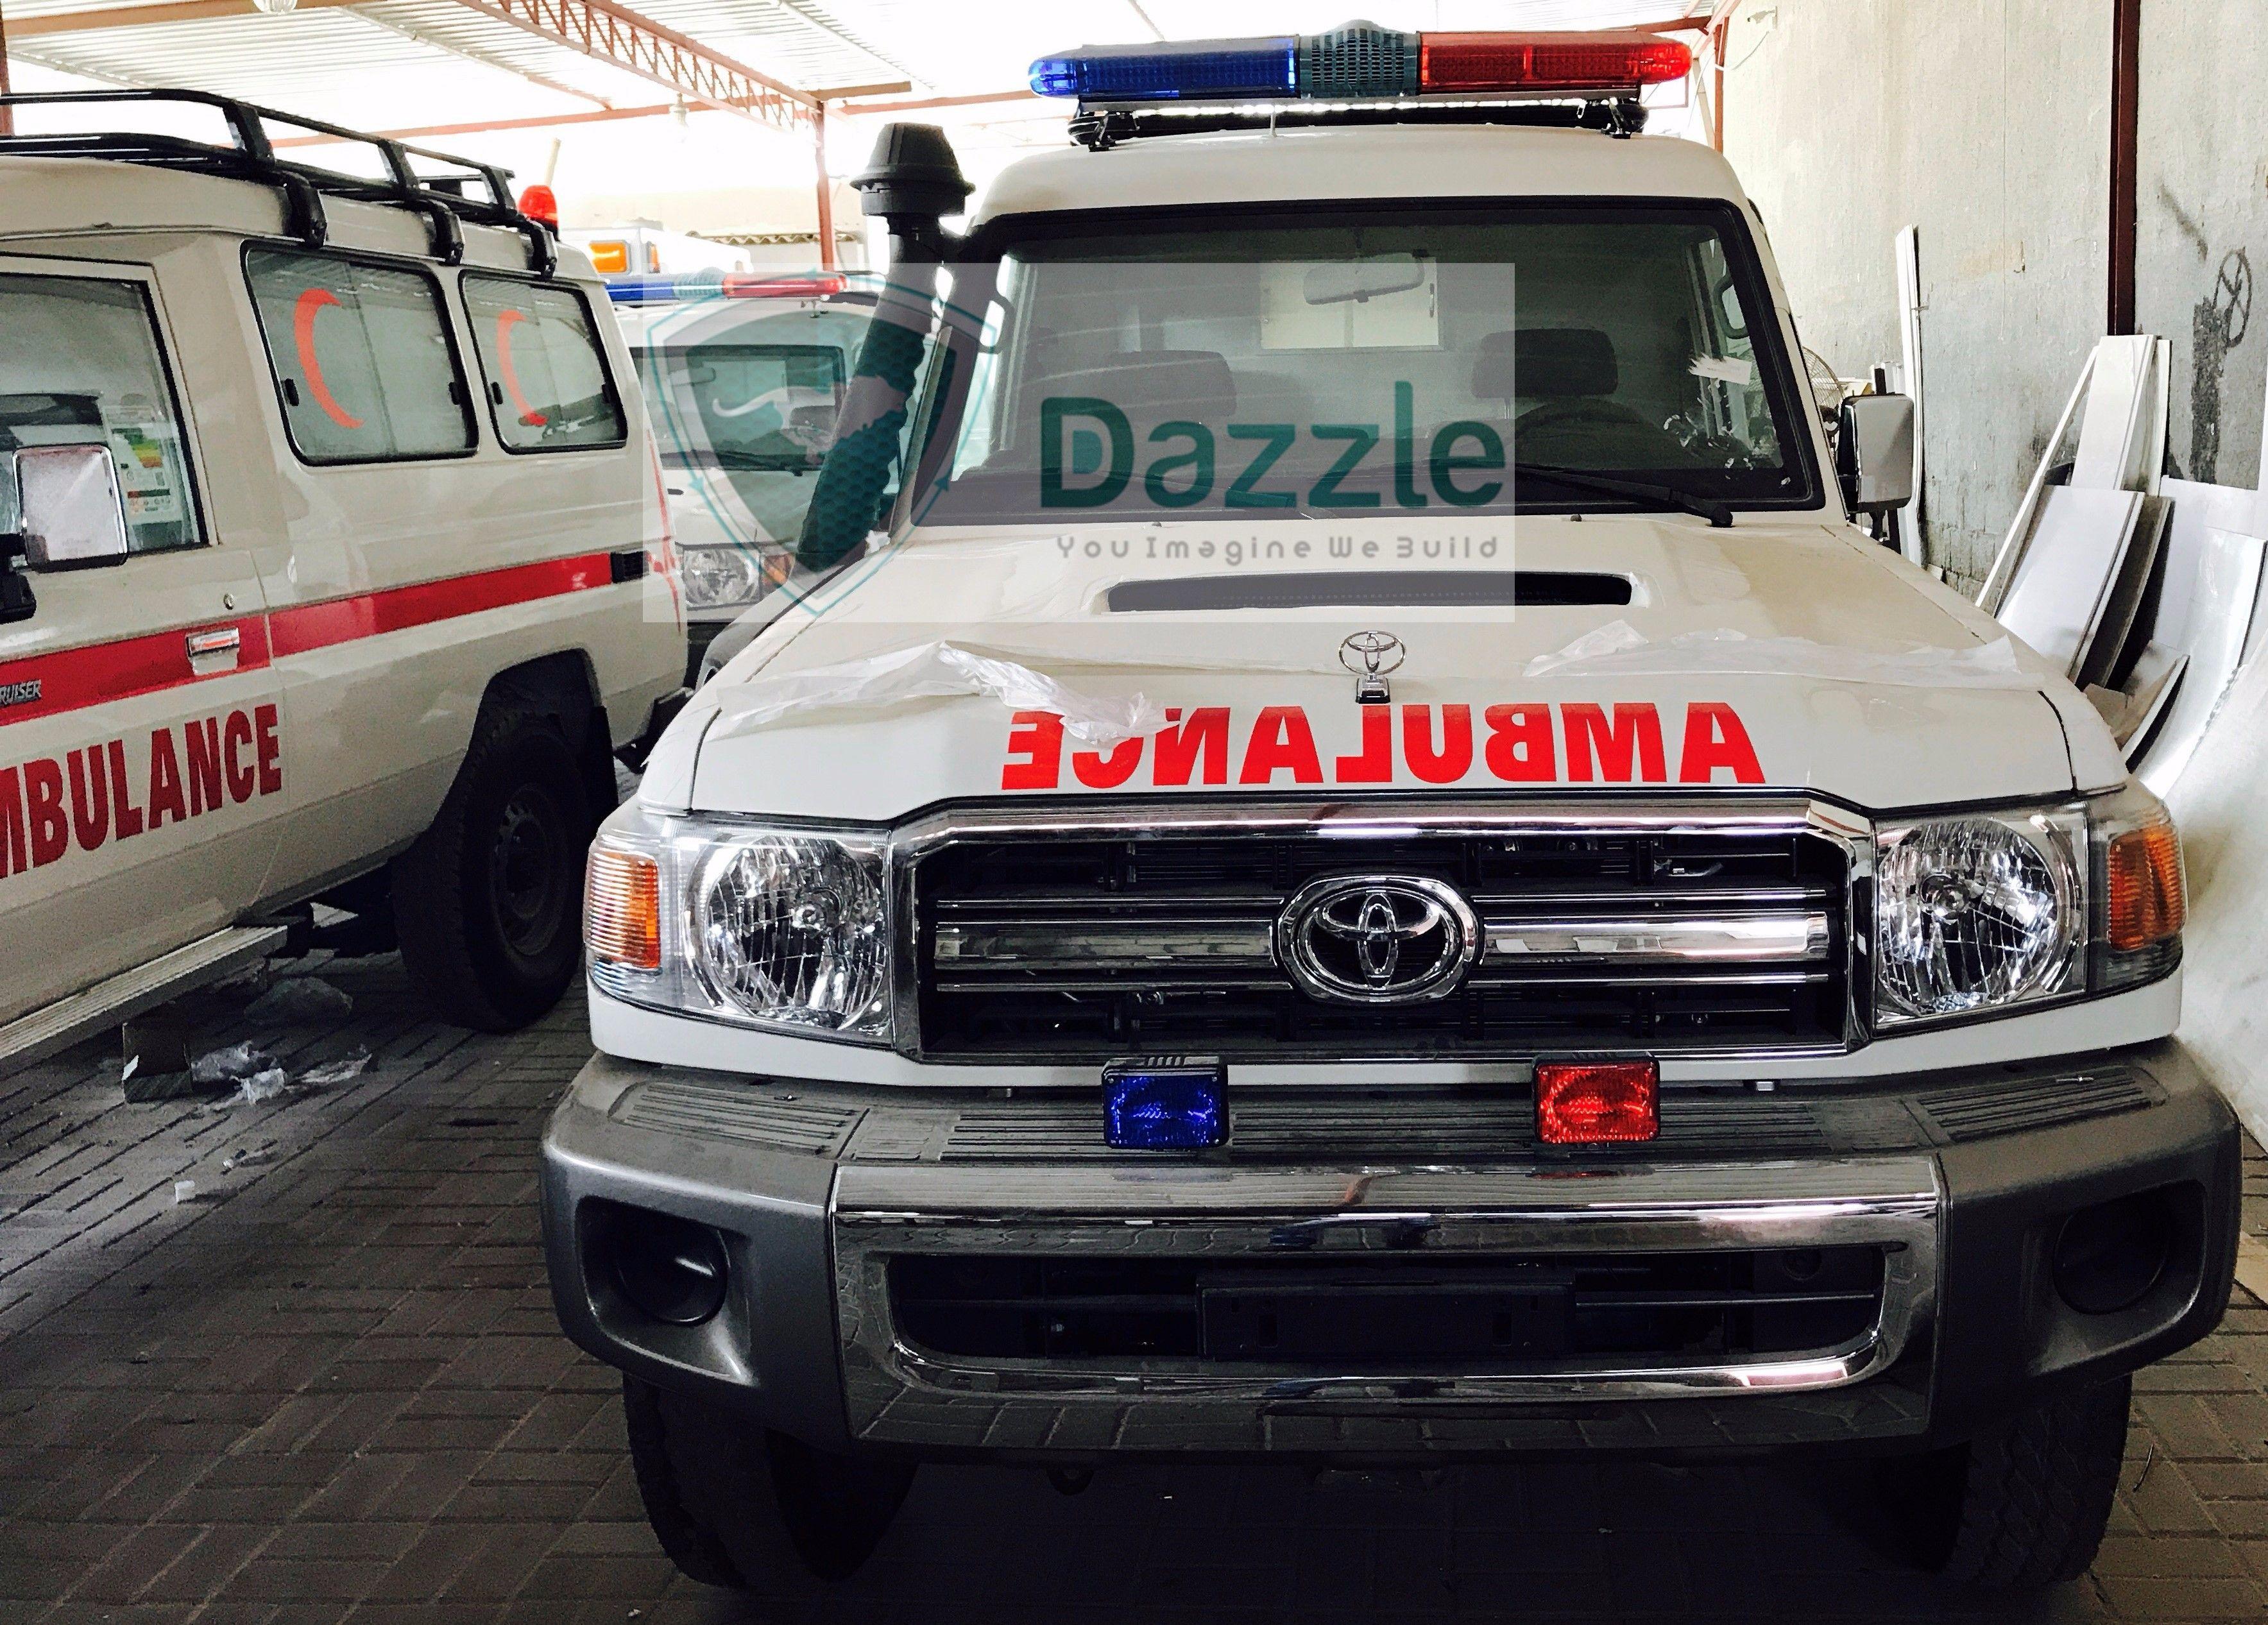 93b88736bb  Toyotalandcruiserambulance  toyotalandcruiserambulanceforsale   ambulanceforexport Toyota Land Cruiser Hard Top VDJ78L-RJMRYV-1D